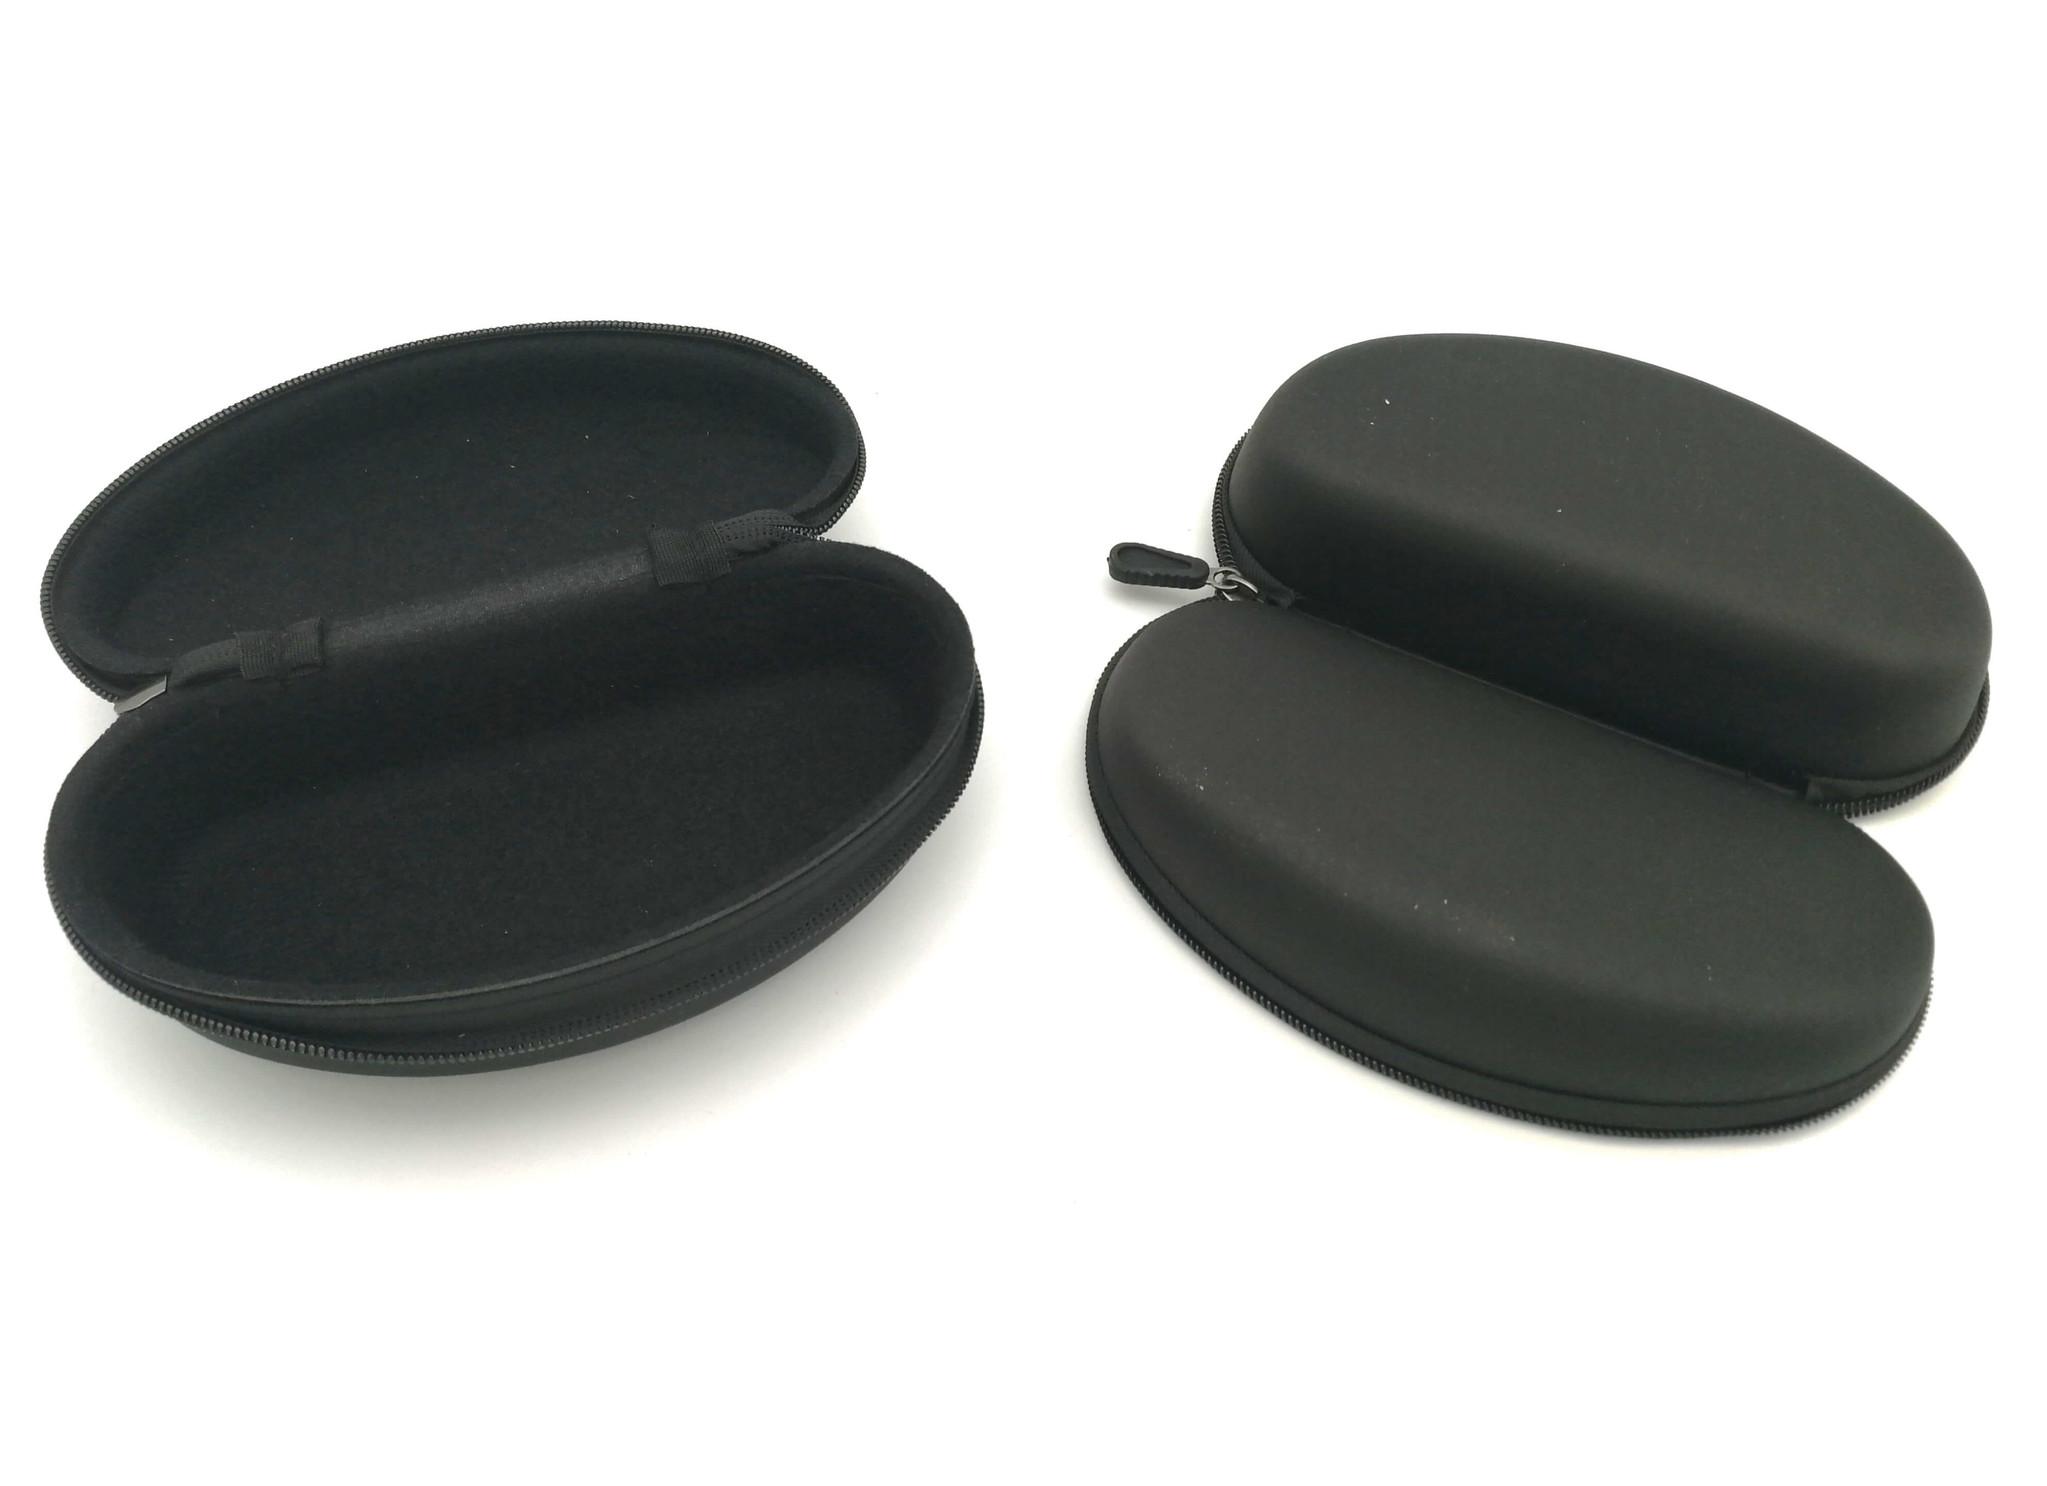 Black glasses case large for SB-F1 and SB-F2